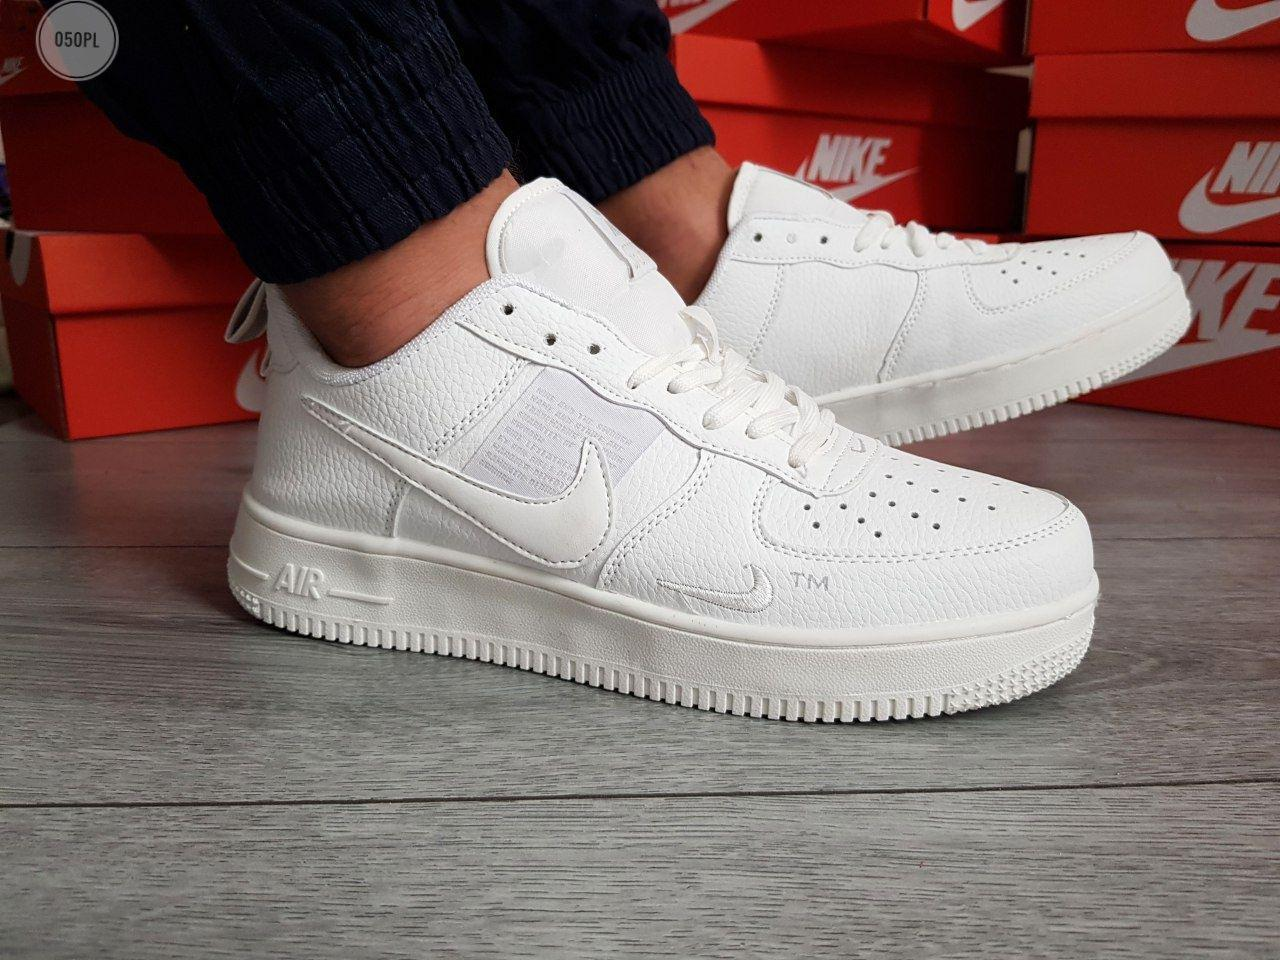 Мужские кроссовки Nike Air Force 19 Low White (р. 41 42 43 44 45) Белые